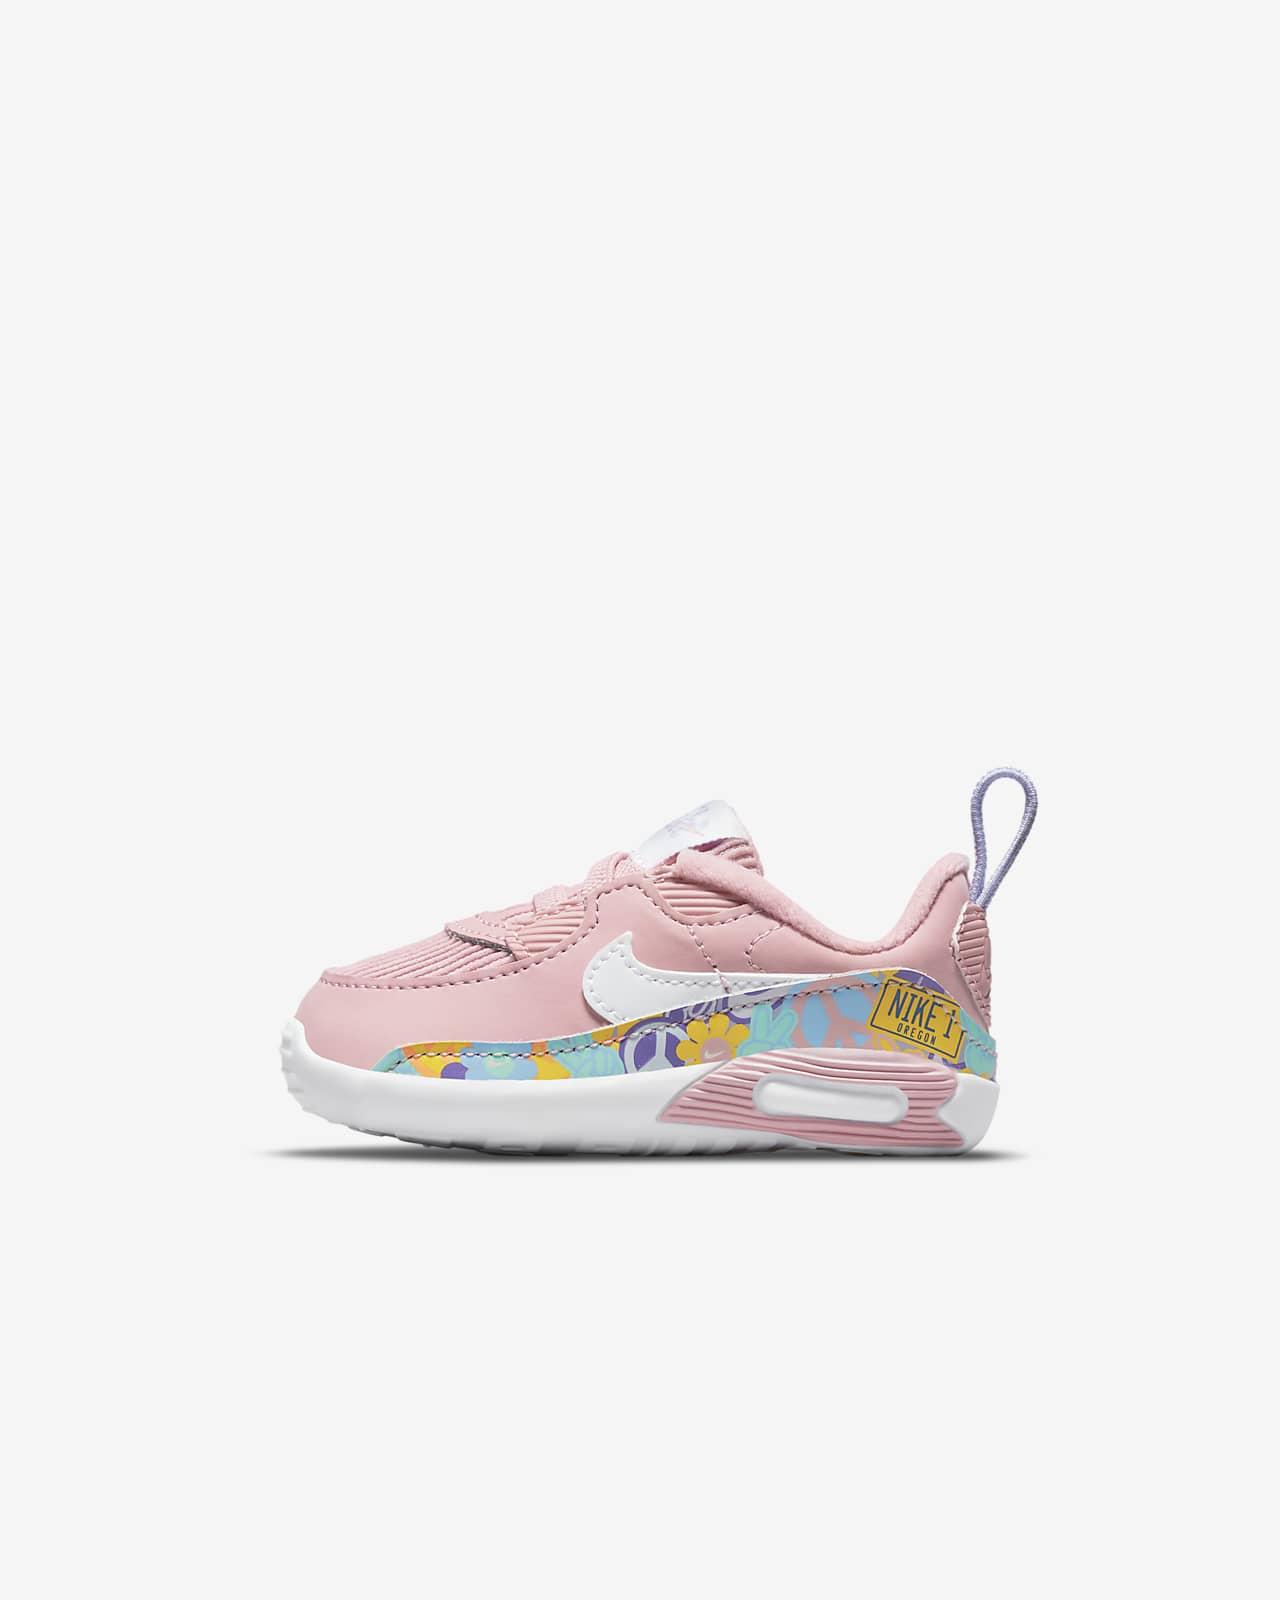 Nike Max 90 SE 嬰兒鞋款